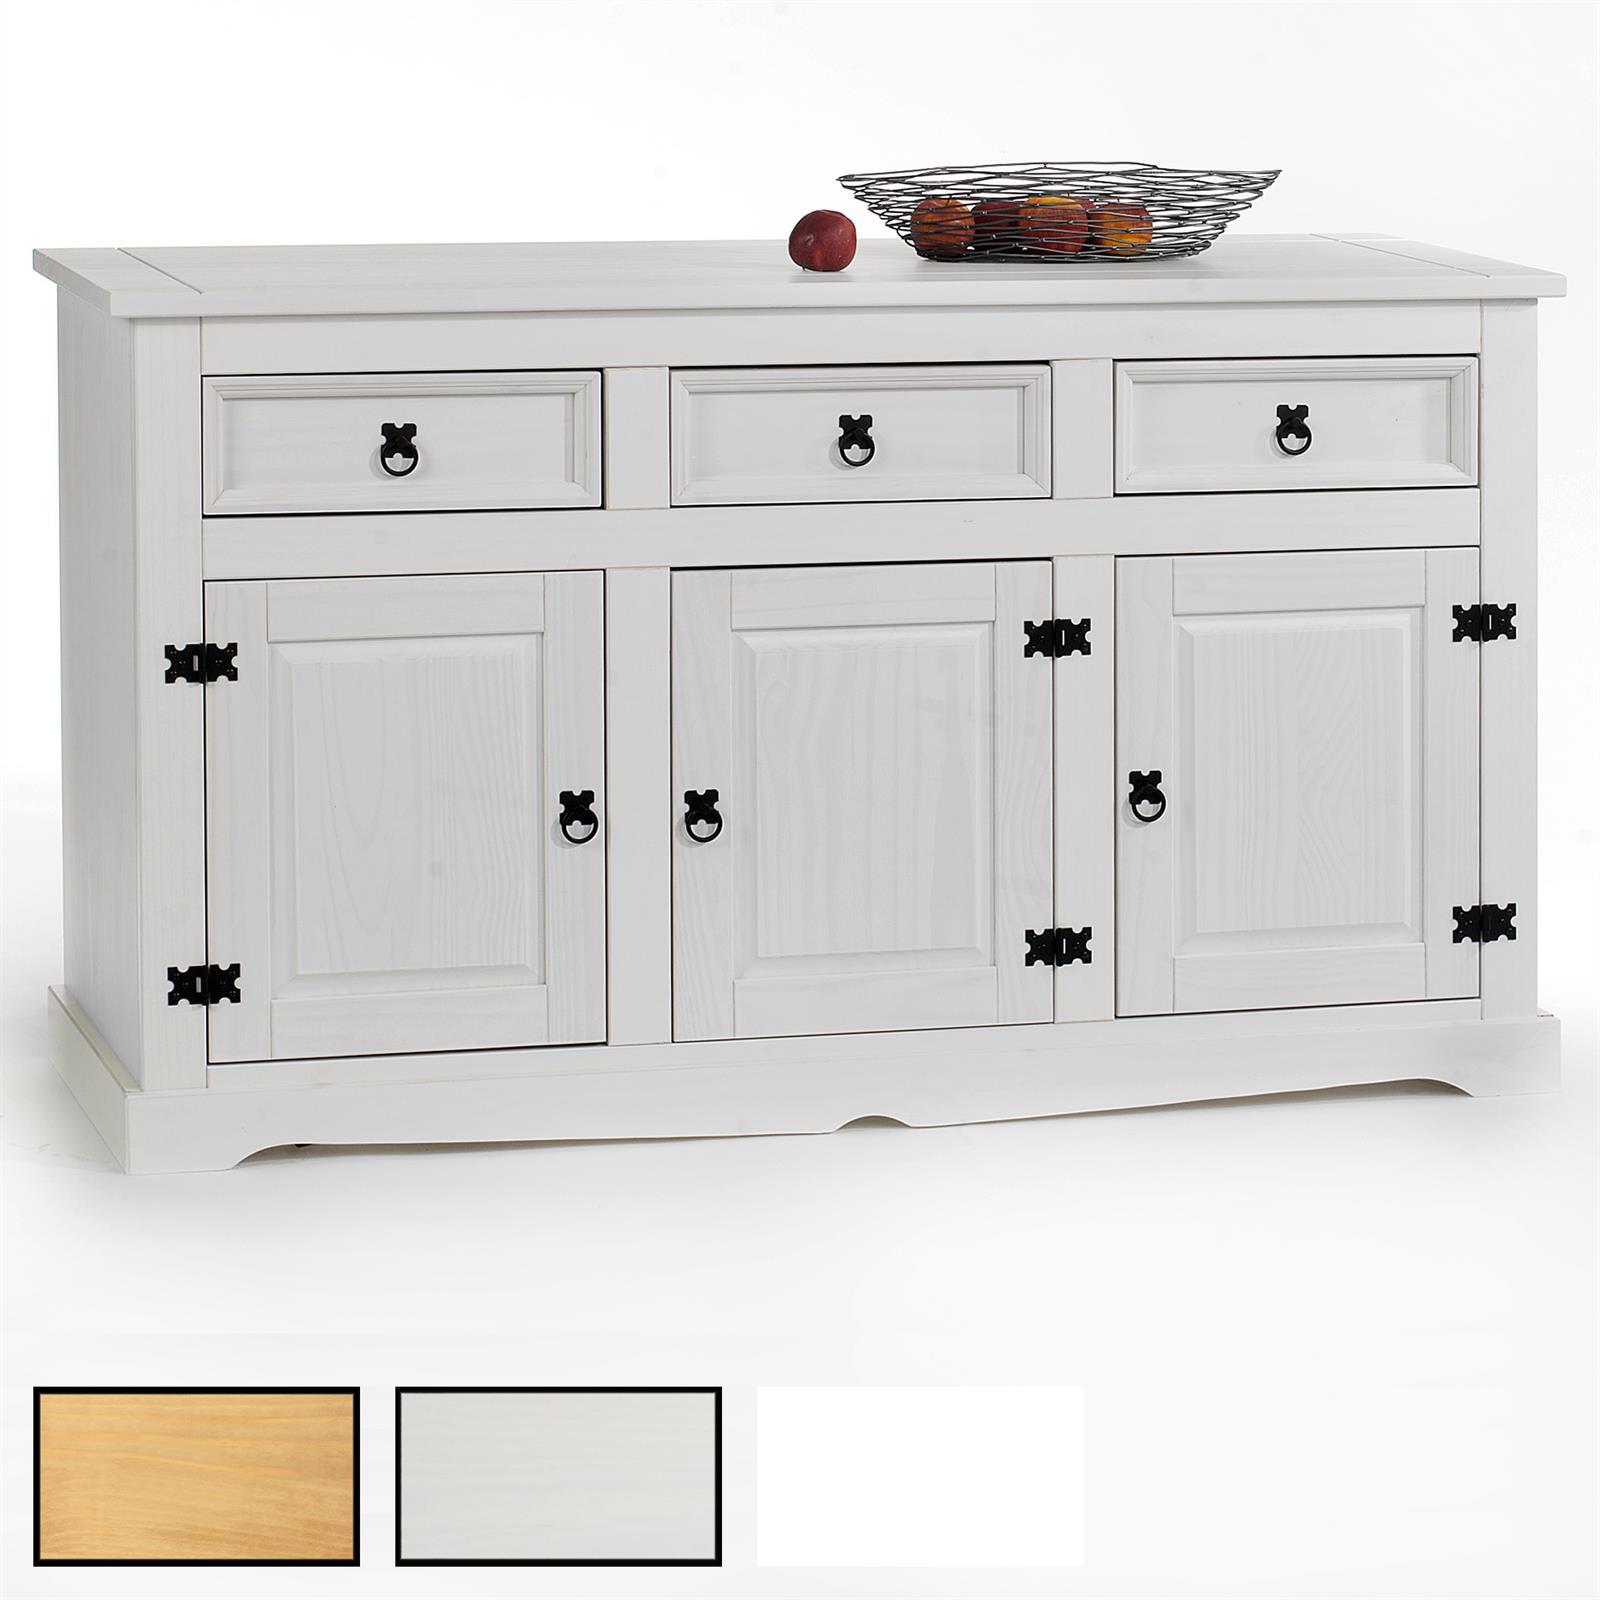 buffet en pin tequila style mexicain 3 coloris disponibles mobil meubles. Black Bedroom Furniture Sets. Home Design Ideas